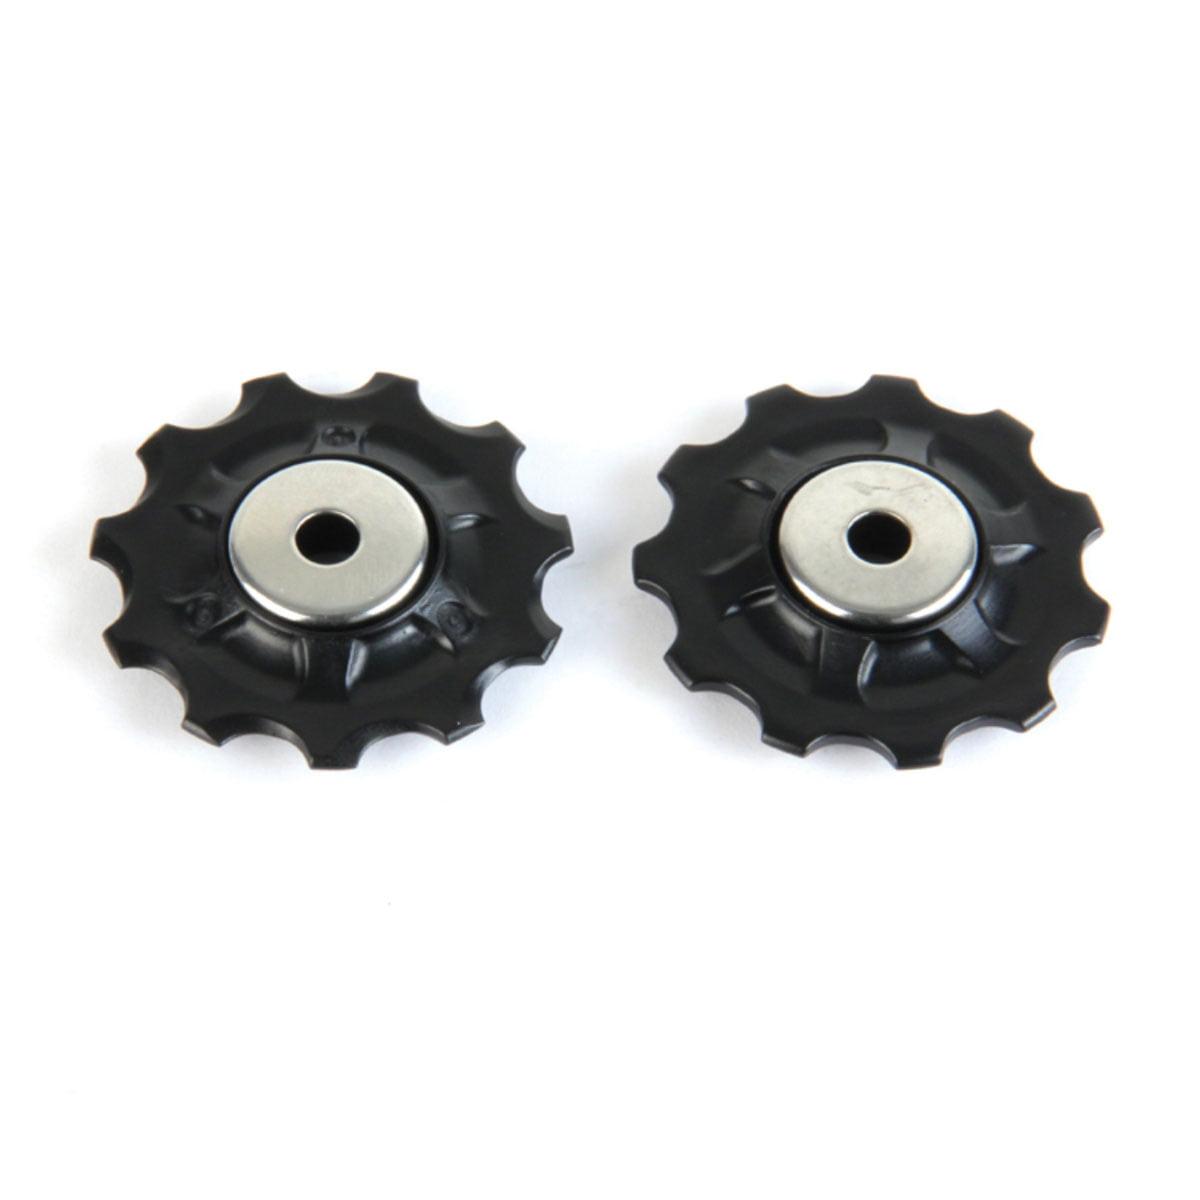 SRAM X5 9/10 Speed Bicycle Rear Derailleur Pulley Kit - 11.7518.019.000